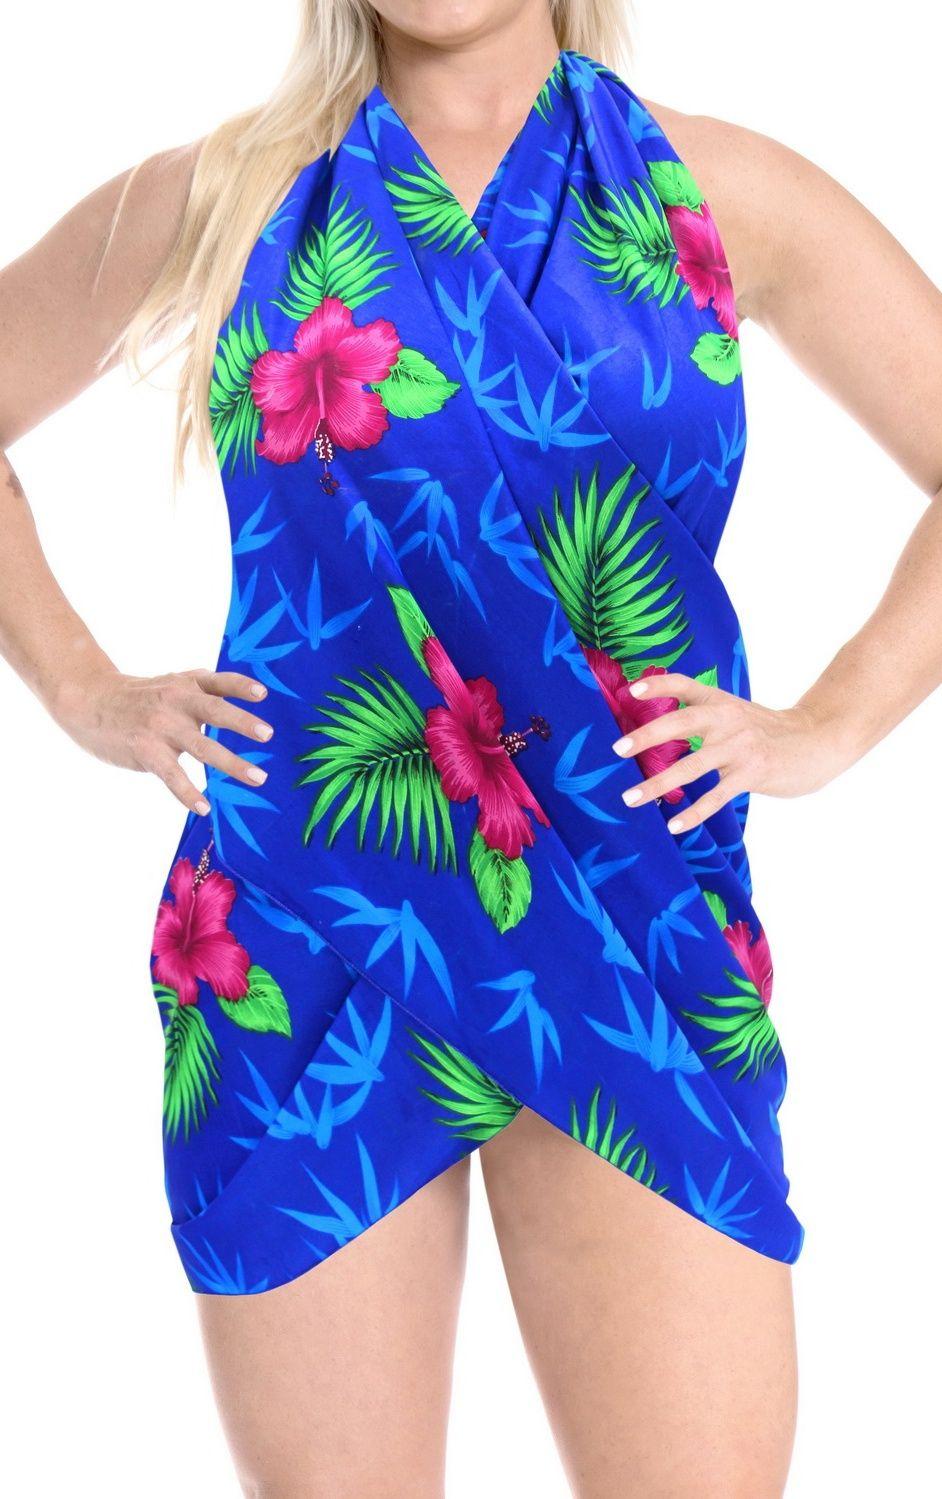 11b2faa164 LA LEELA Women's Beachwear Bathing Mini Sarong Bikini Cover up Wrap Dress  8#Beachwear, #Bathing, #Women